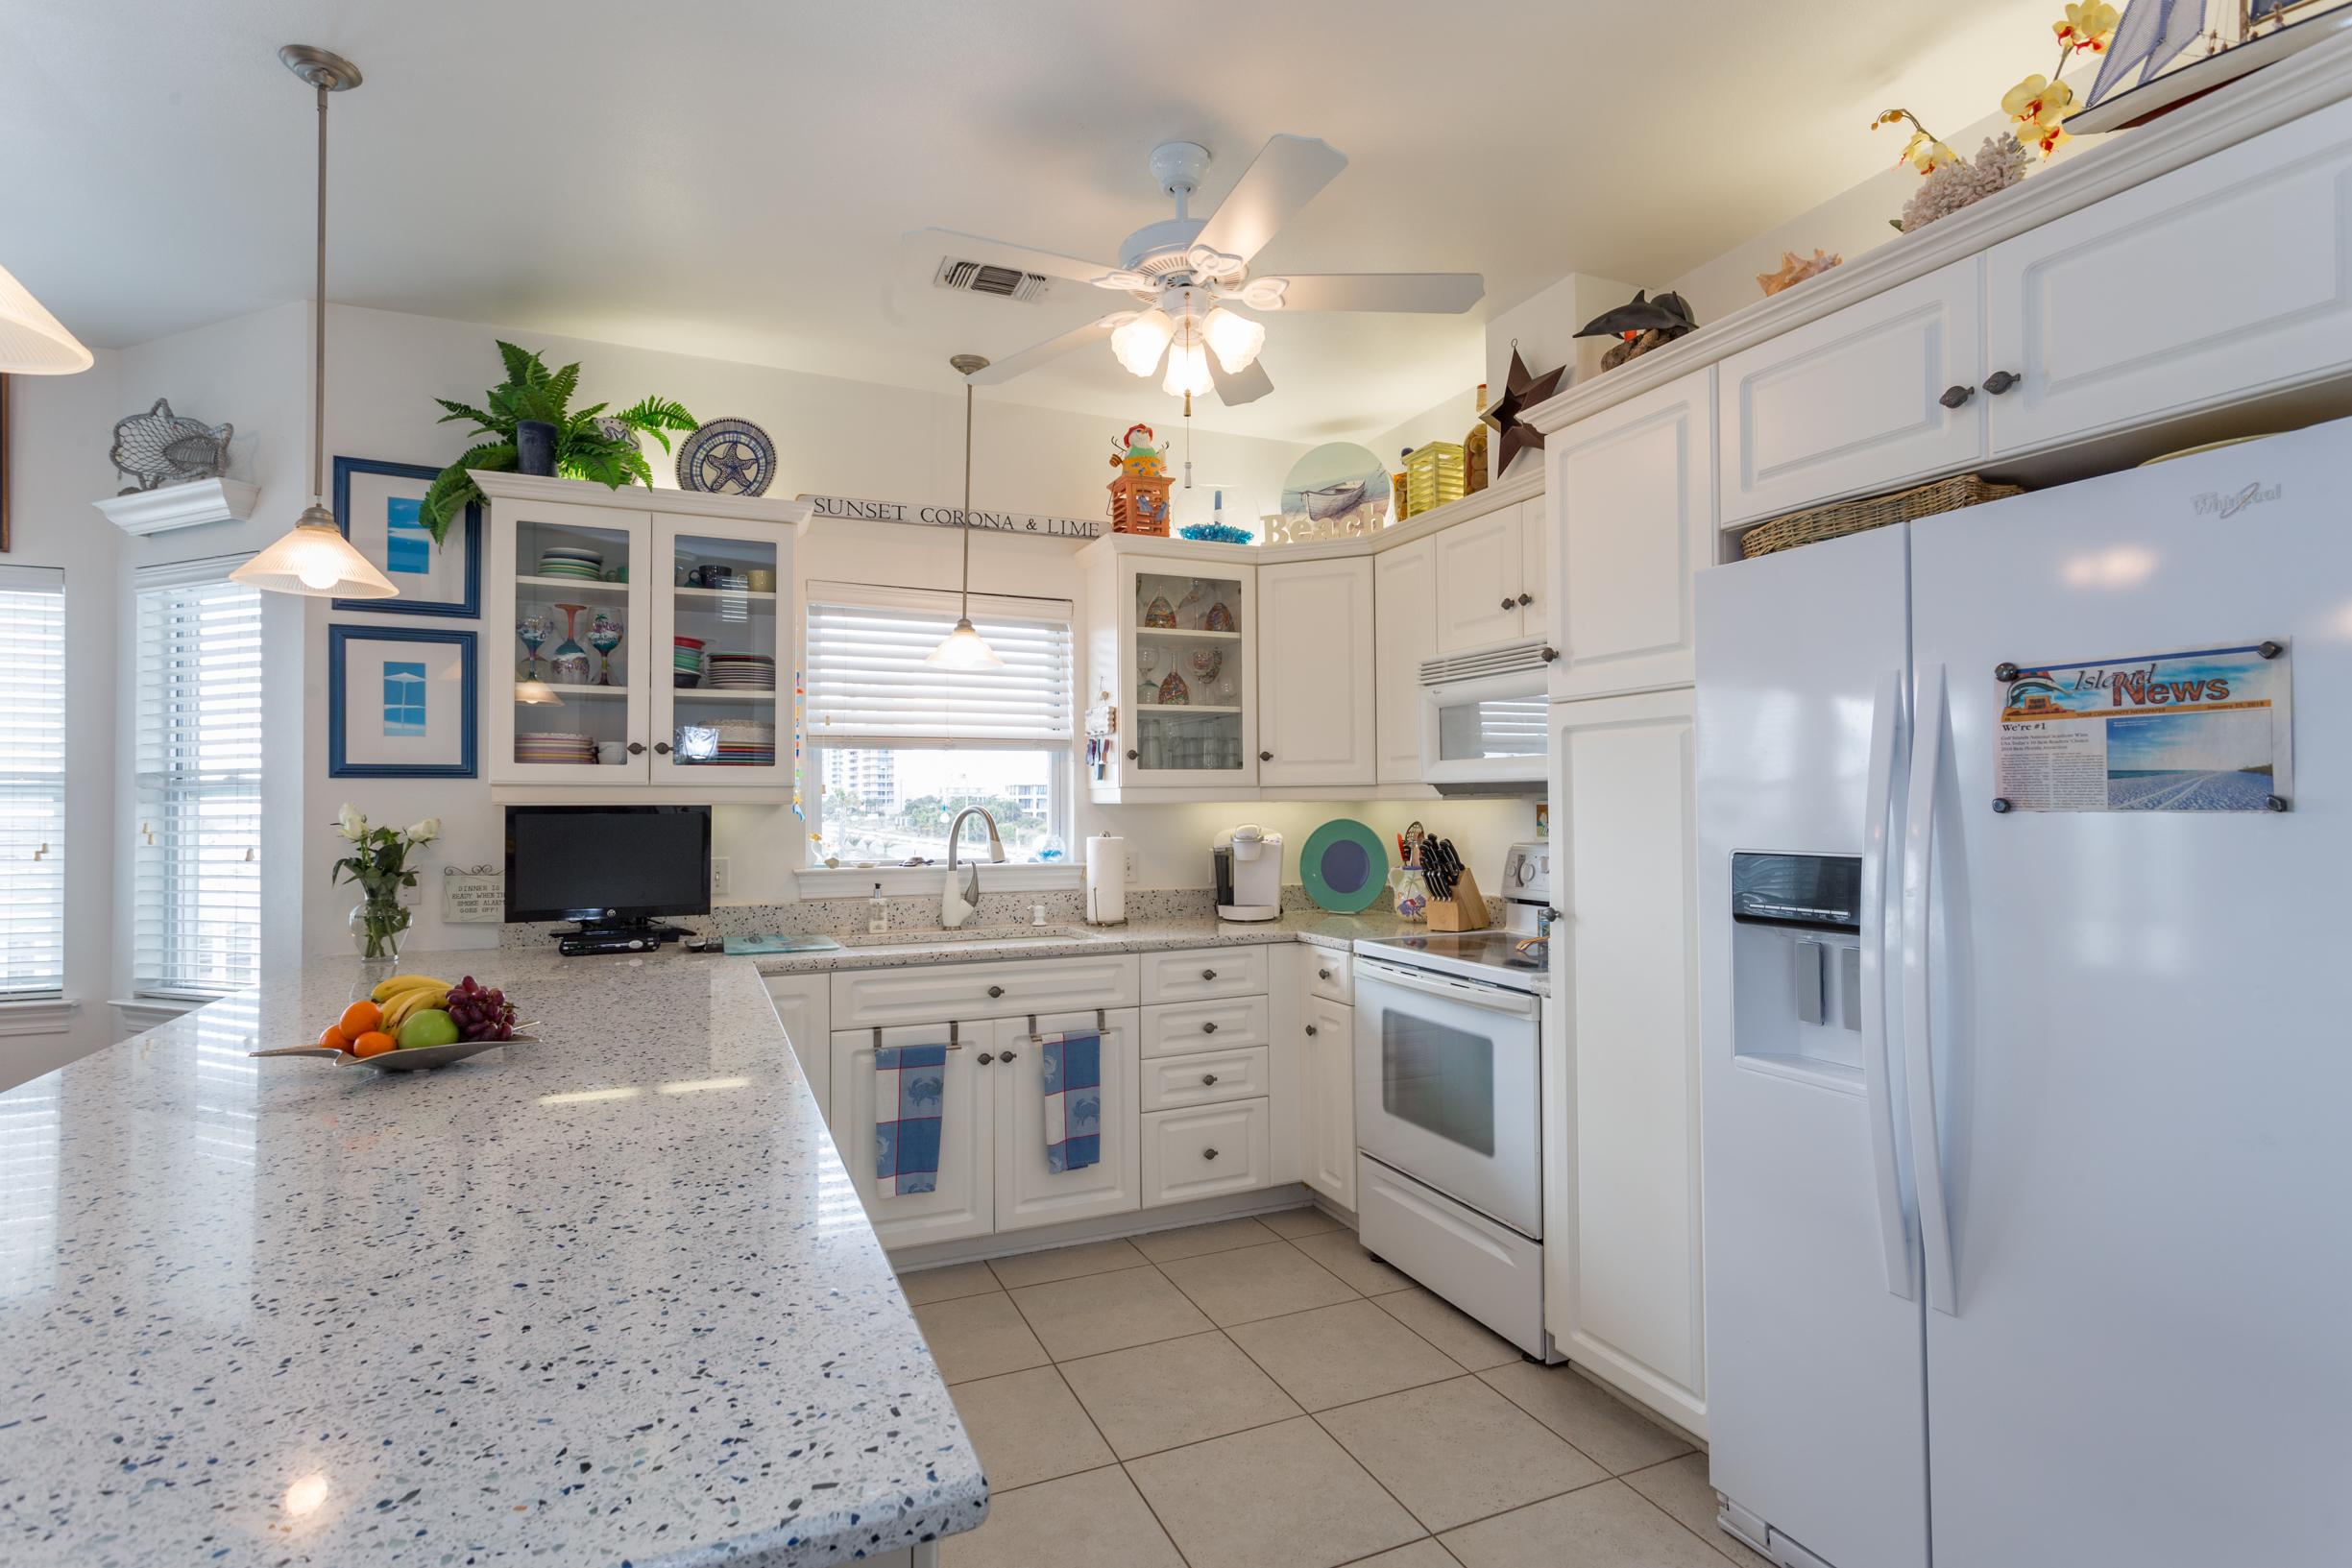 White Sands Cottage 501 Life's a Beach House Townhouse rental in White Sands Pensacola Beach in Pensacola Beach Florida - #4